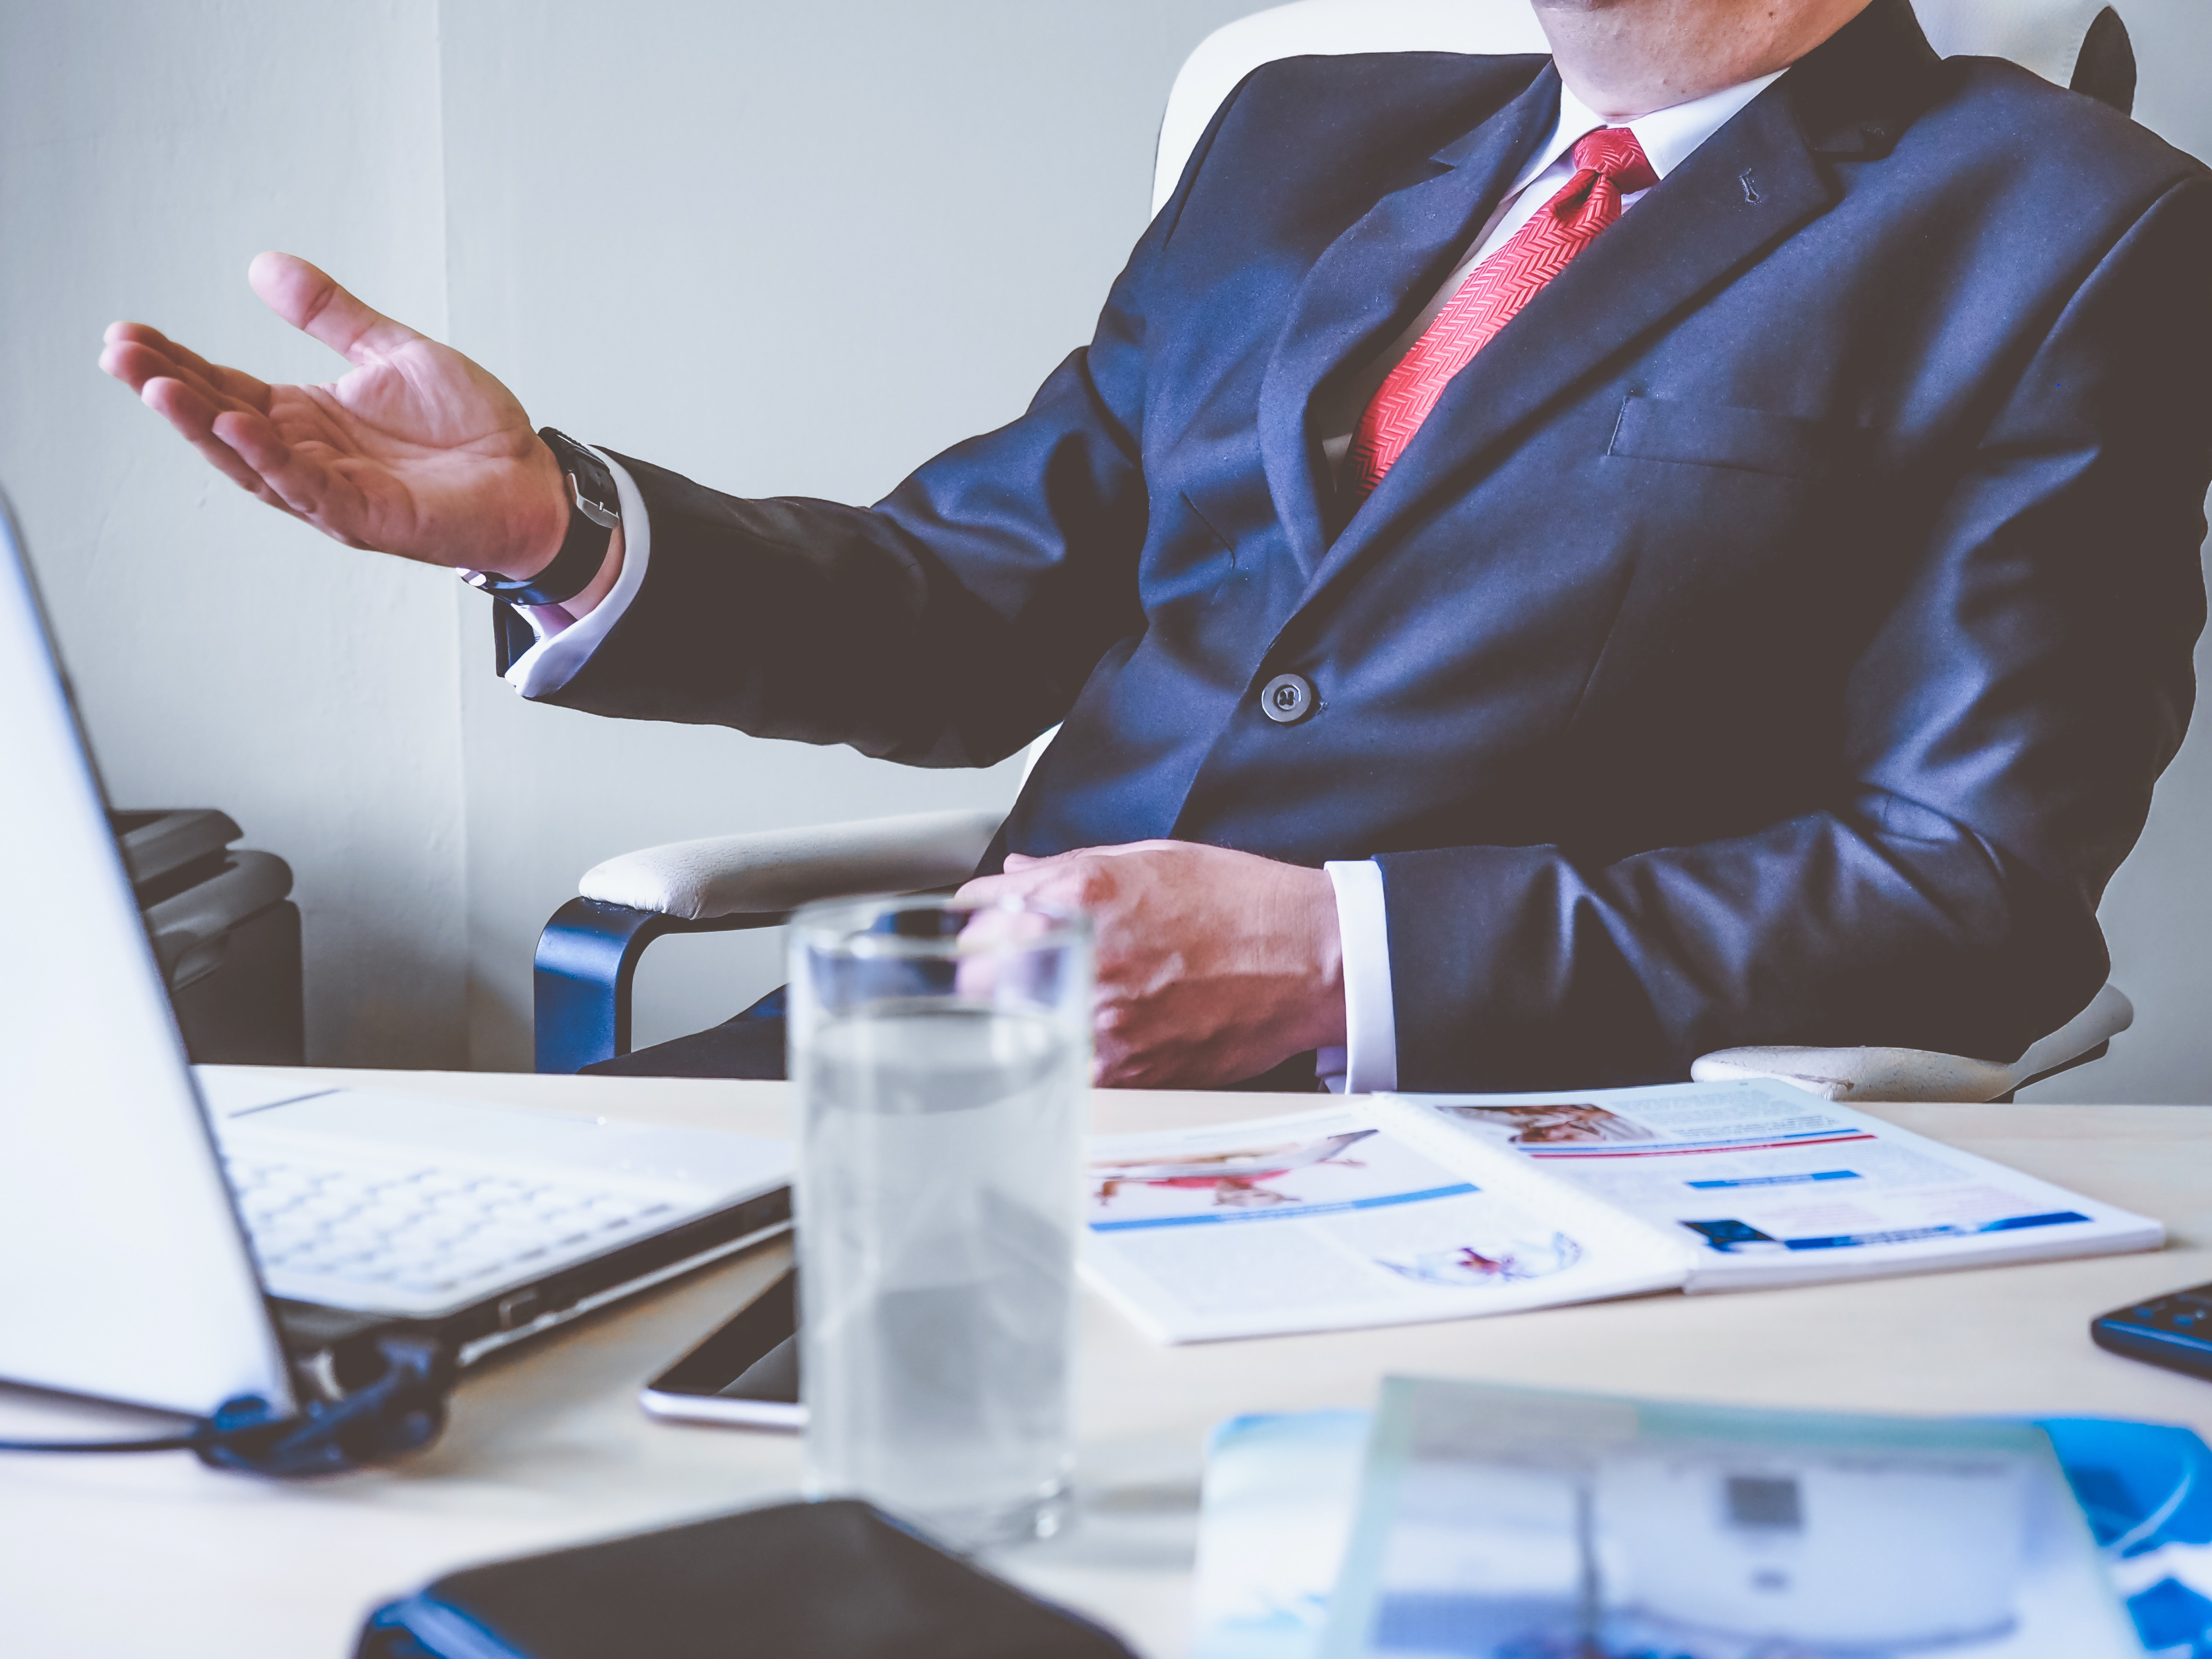 Bewerbungsprozess Karriereportal